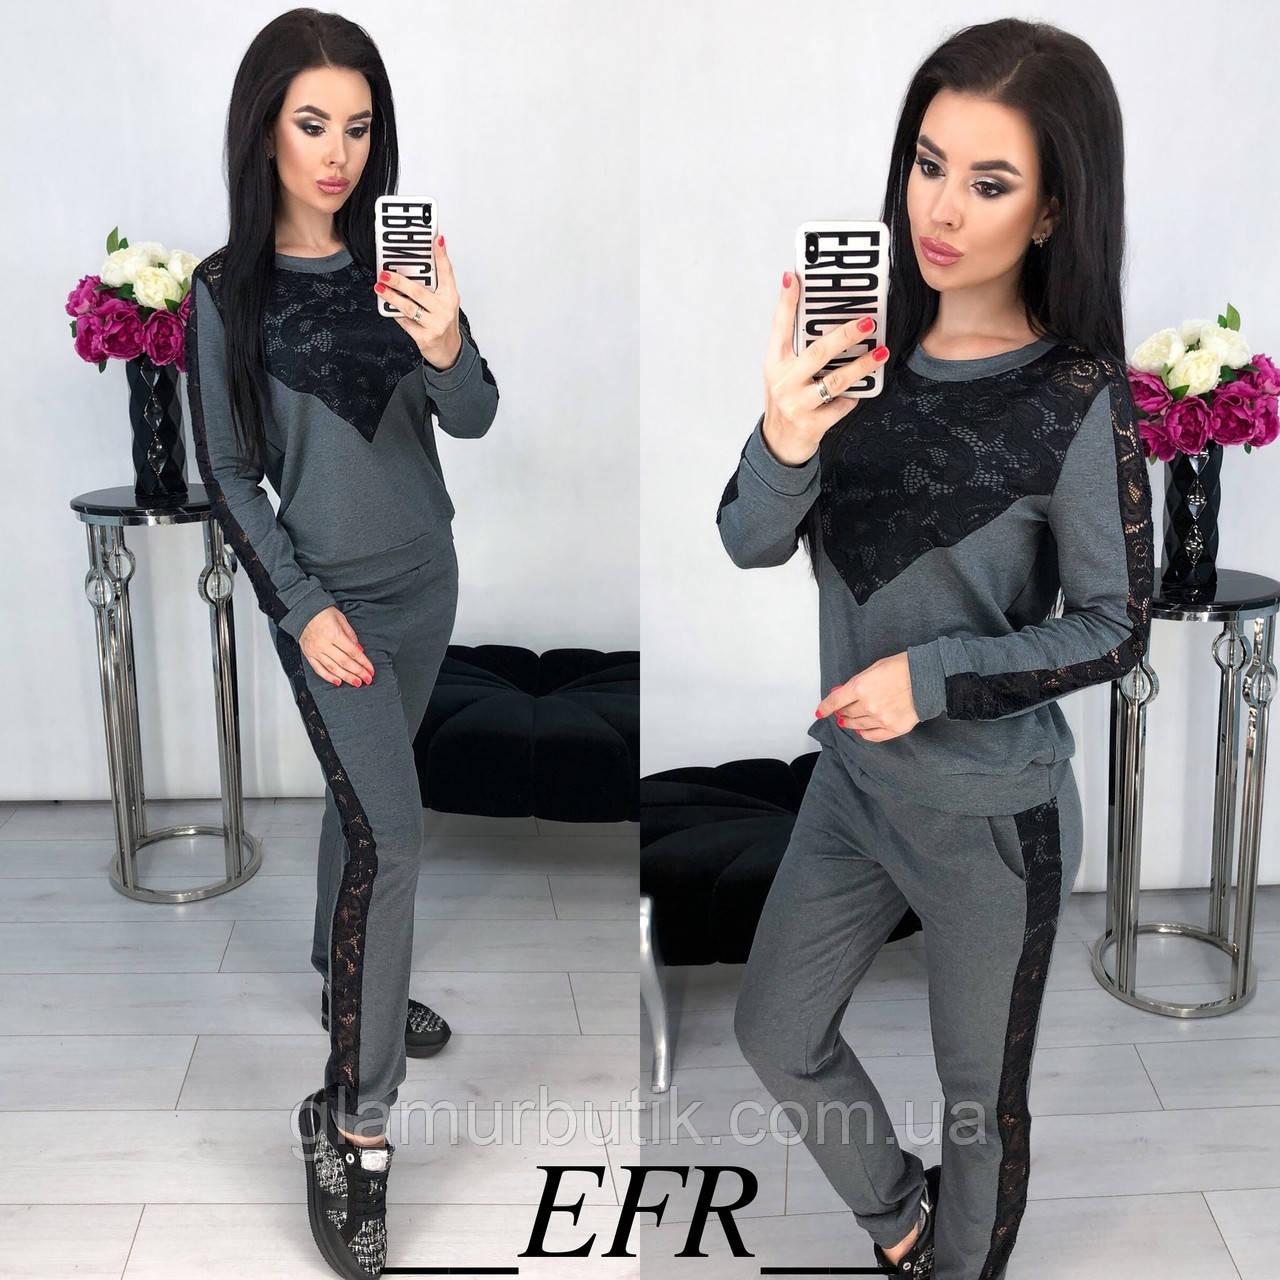 10f7d10162b Женский трикотажный костюм штаны кофта с гипюром серый S-M L-XL ...